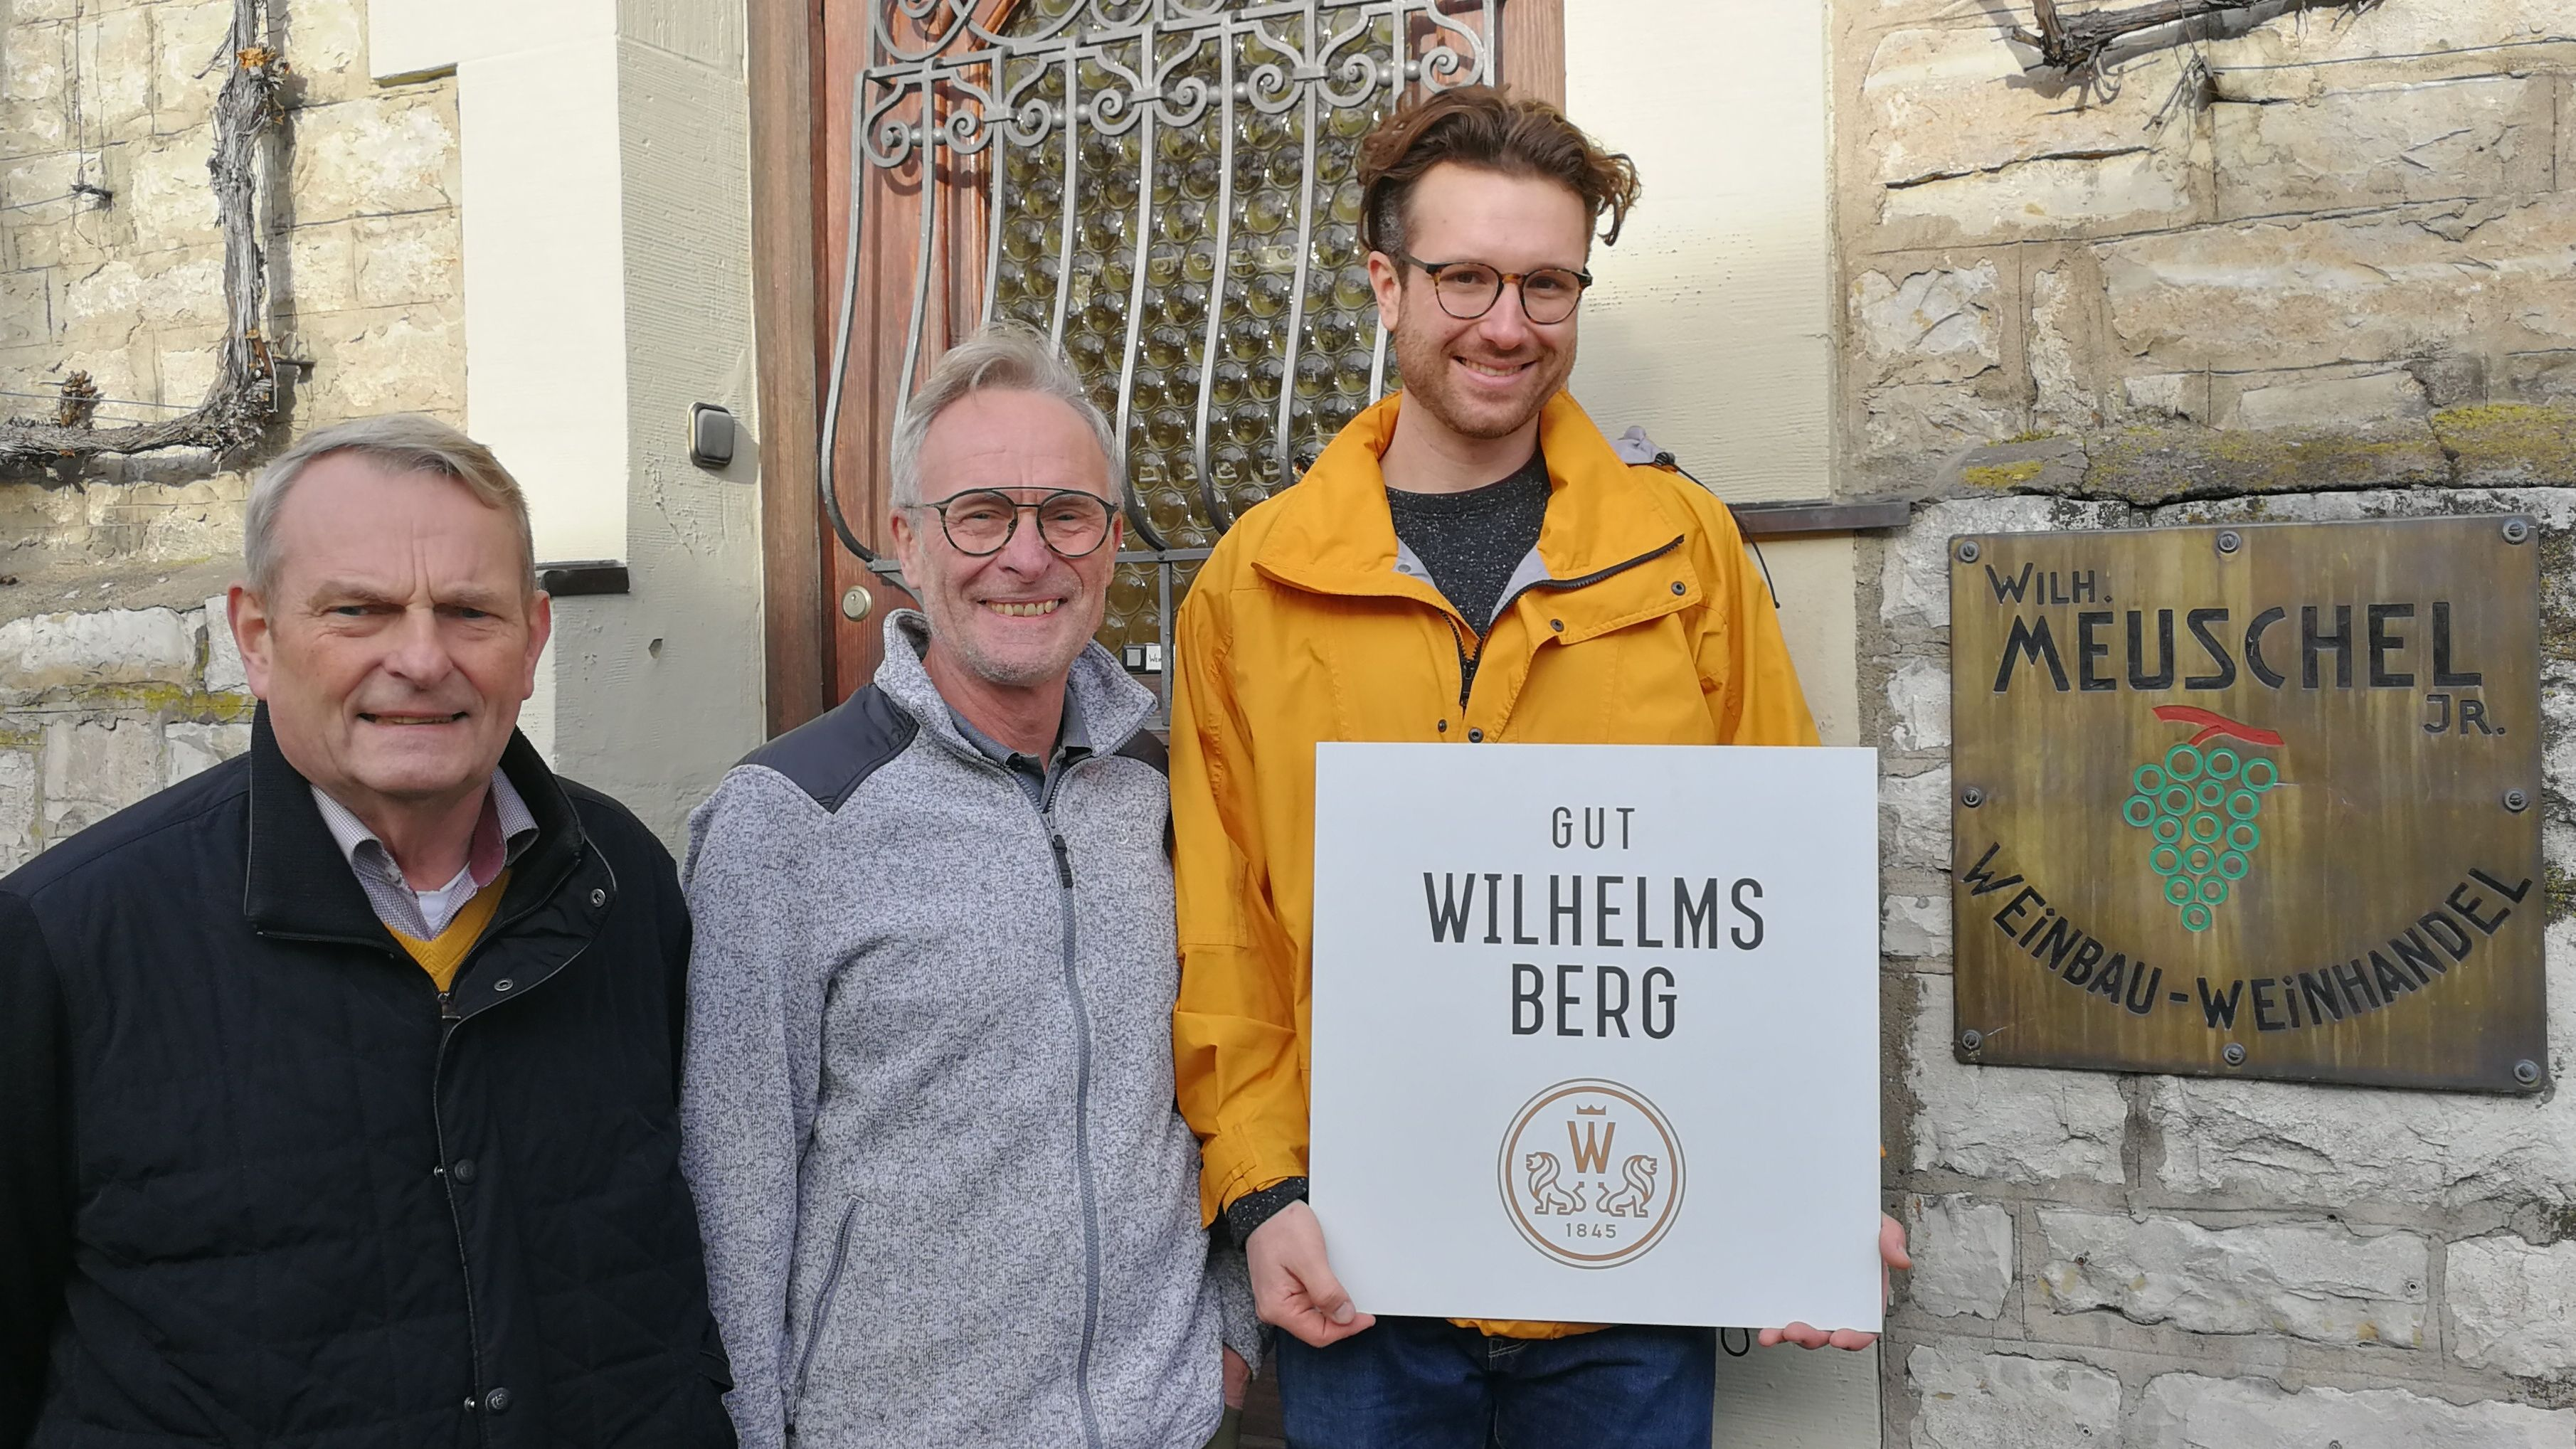 Christian und Johann Meuschel mit Kellermeister Lukas Herrmann (rechts)